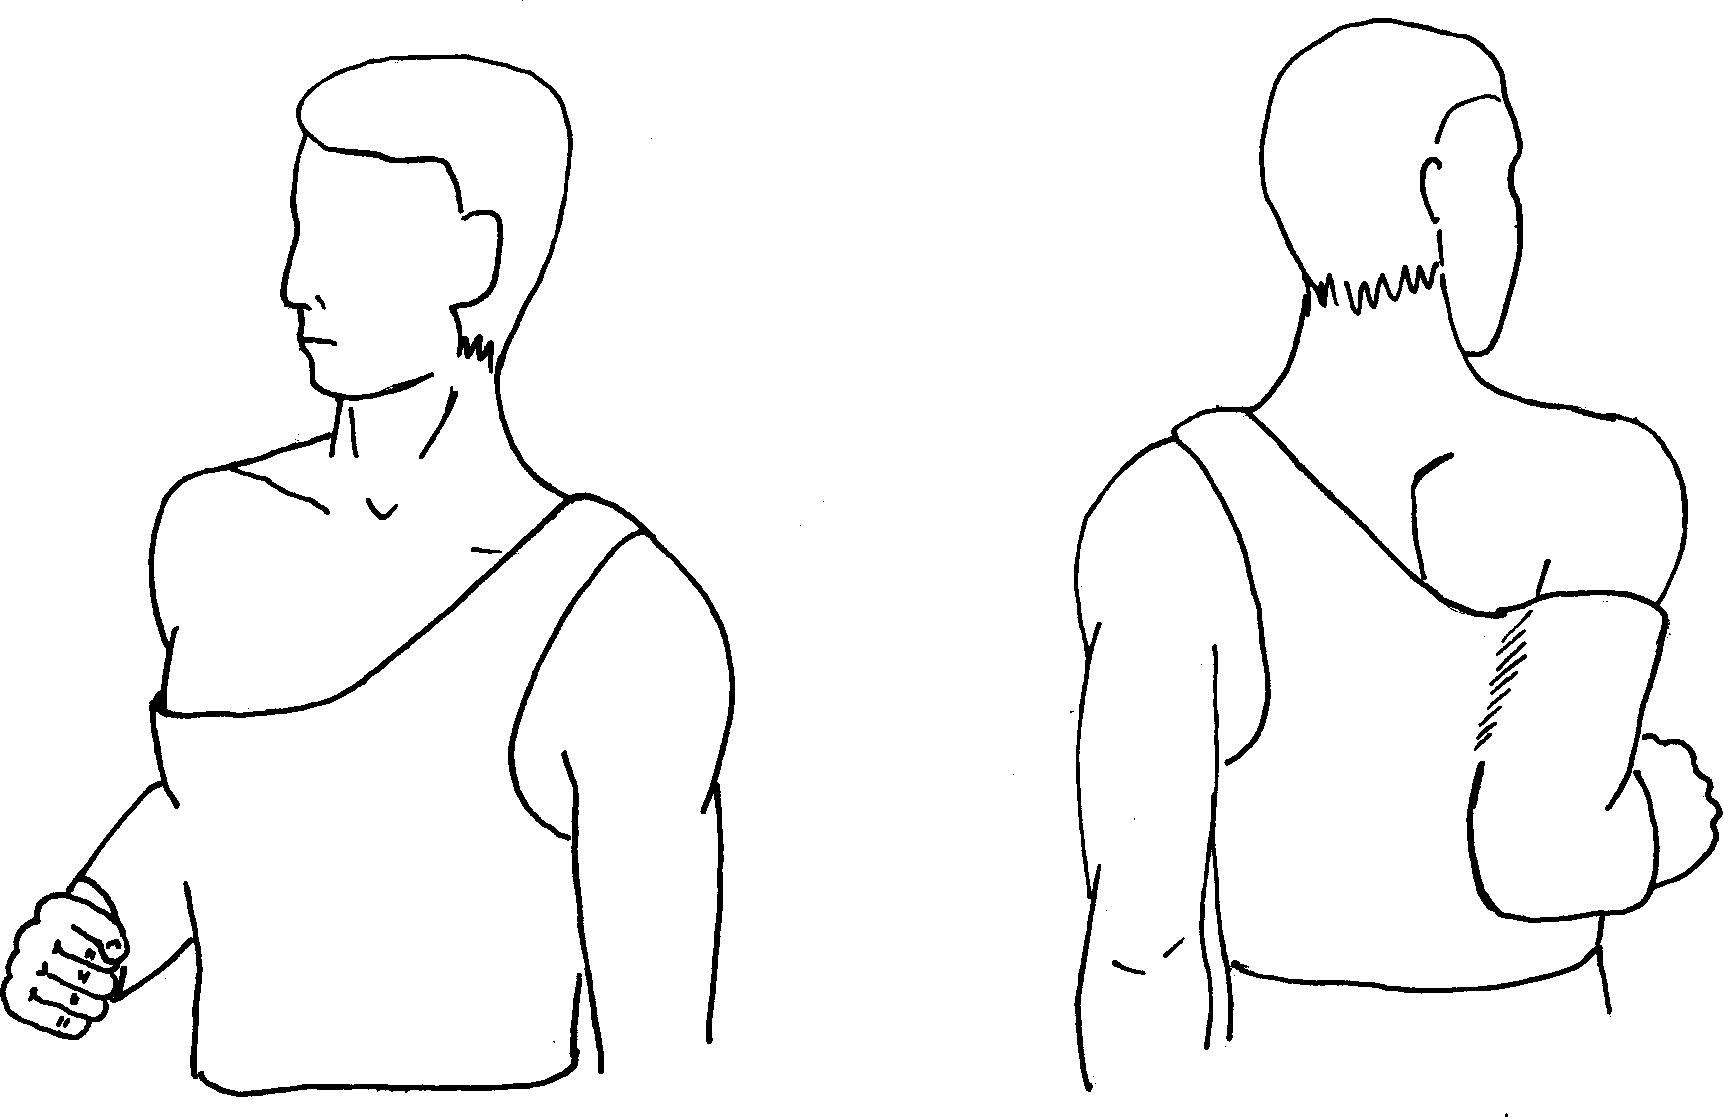 Повязка Смирнова – Вайнштейна